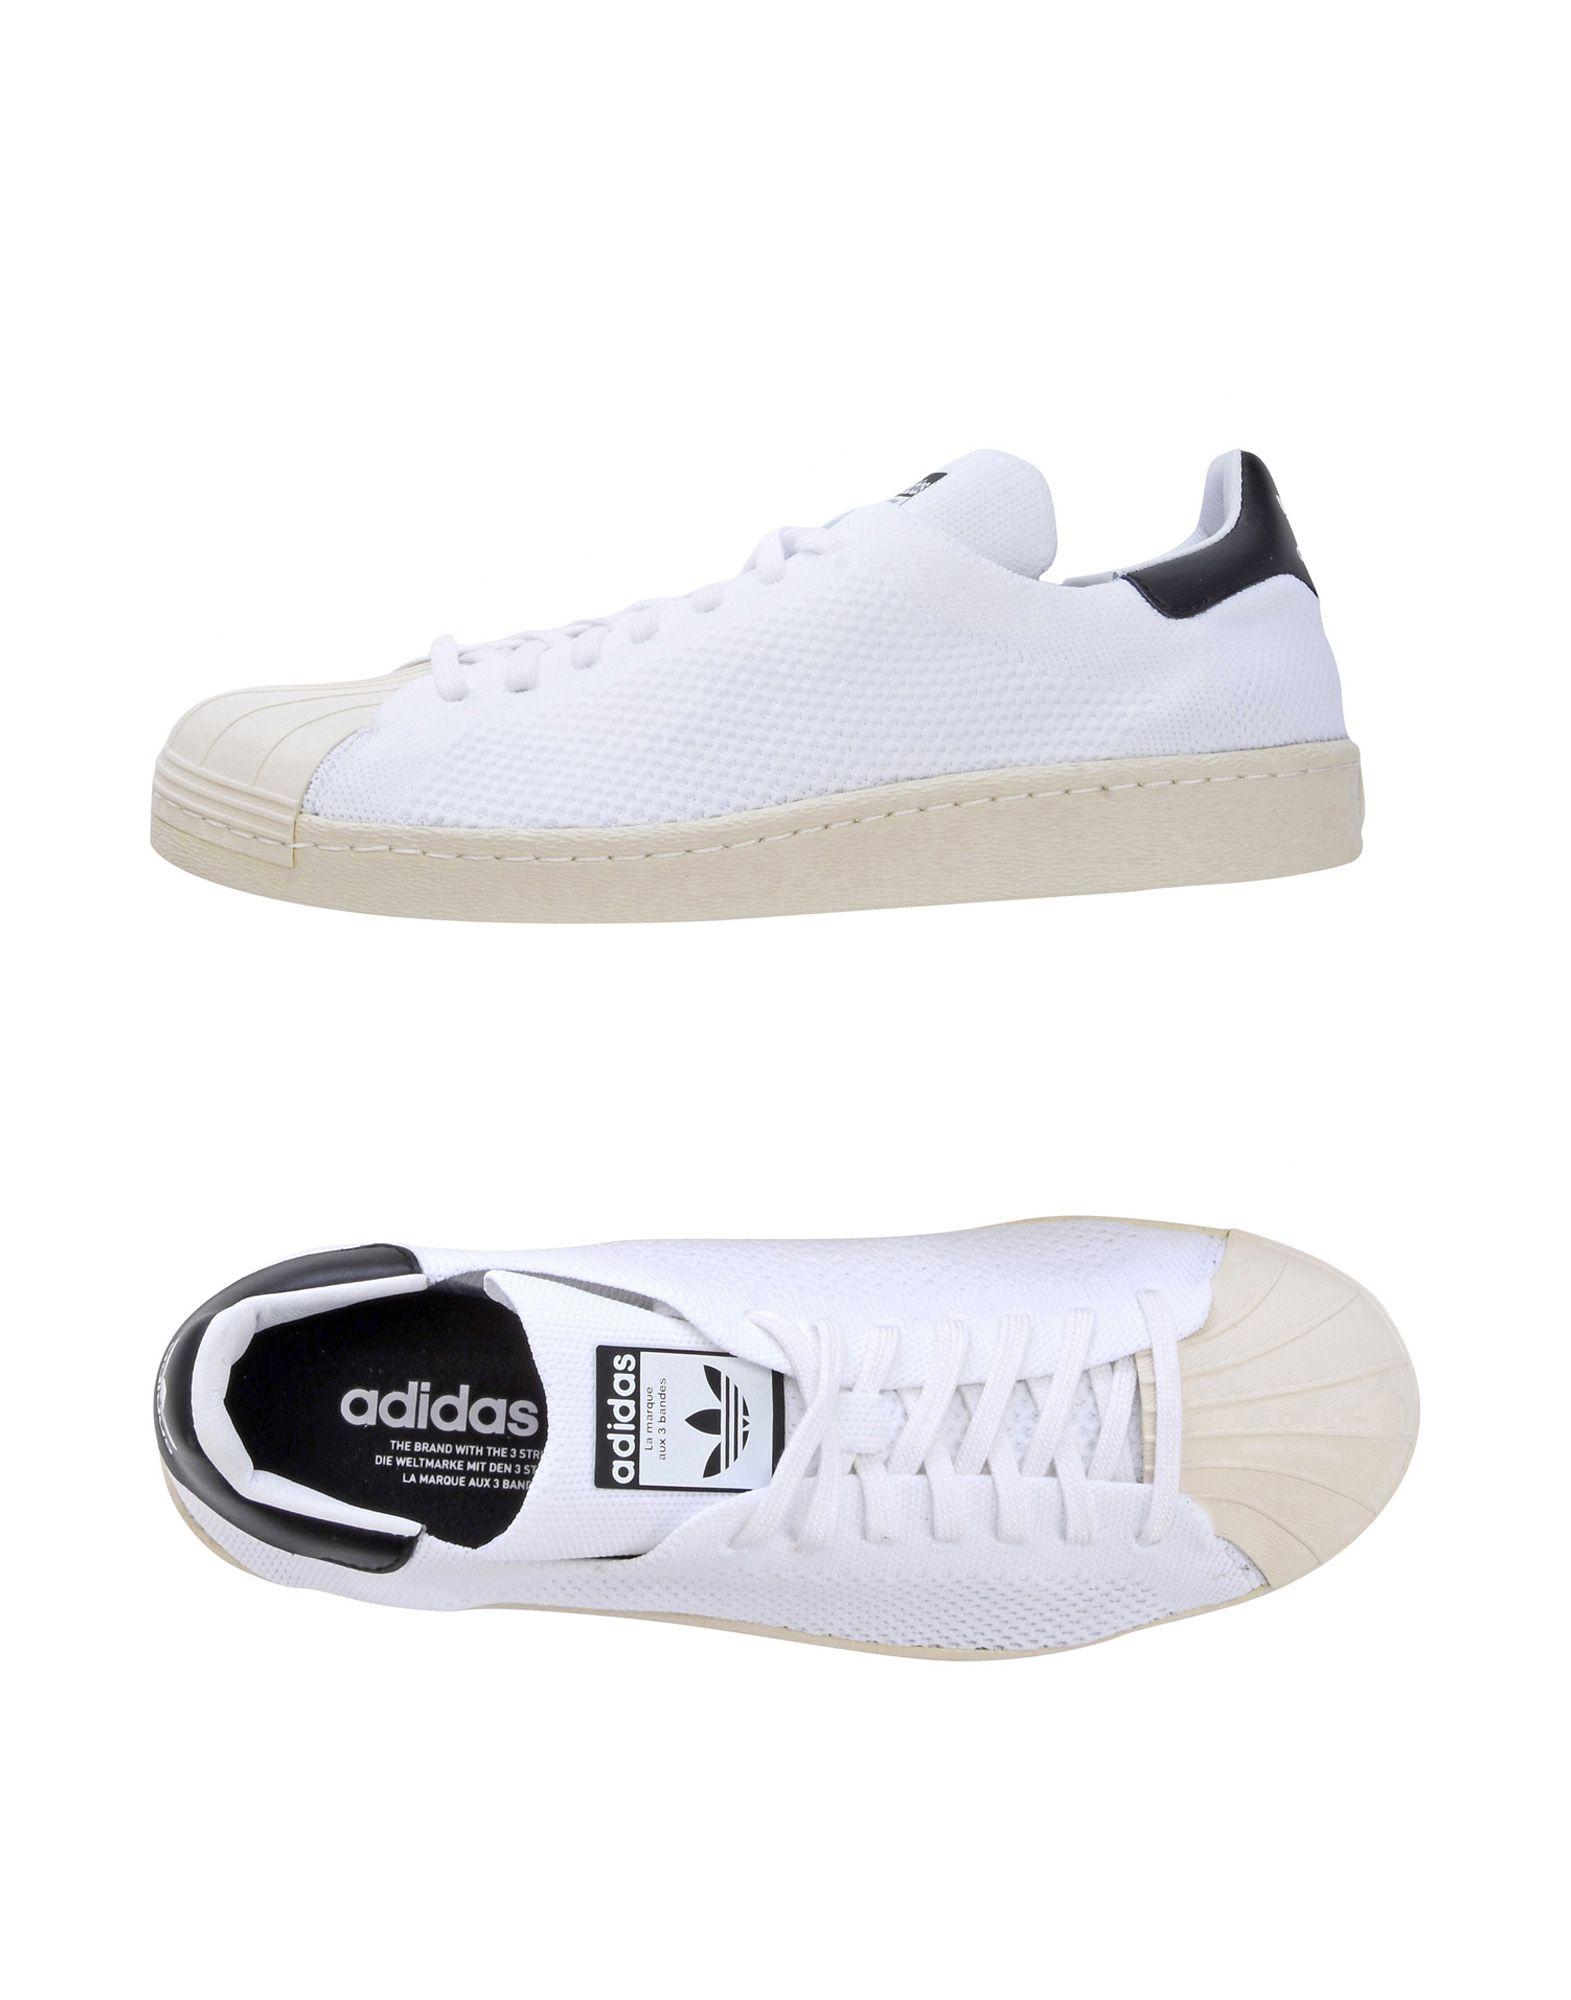 Sneakers Adidas Originals Superstar 80S Pk - Uomo - Acquista online su